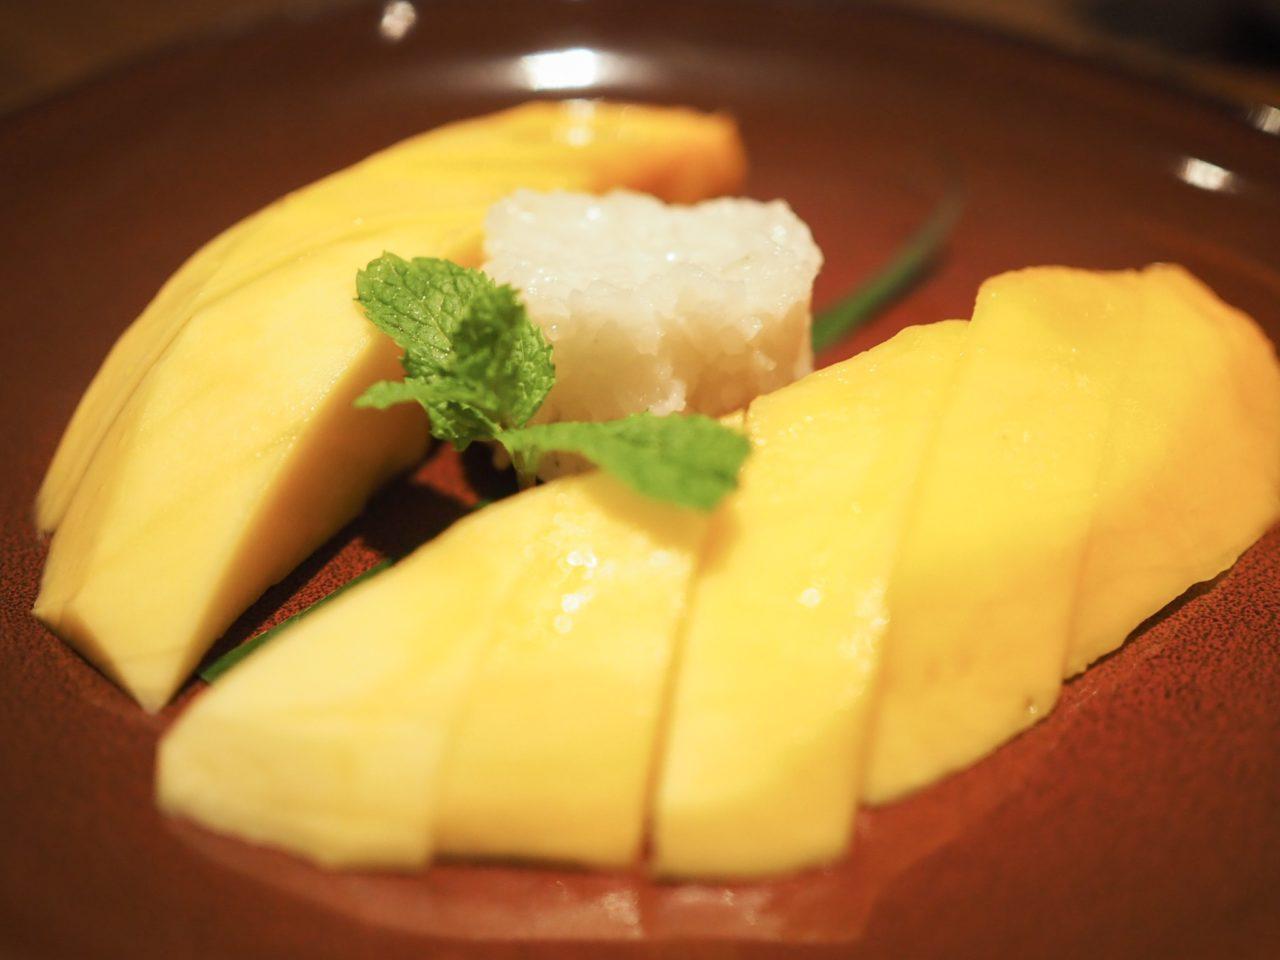 img 2981 - URBAN Cafe - スコータイ上海で味わう本場タイの味!期間限定メニューのご紹介